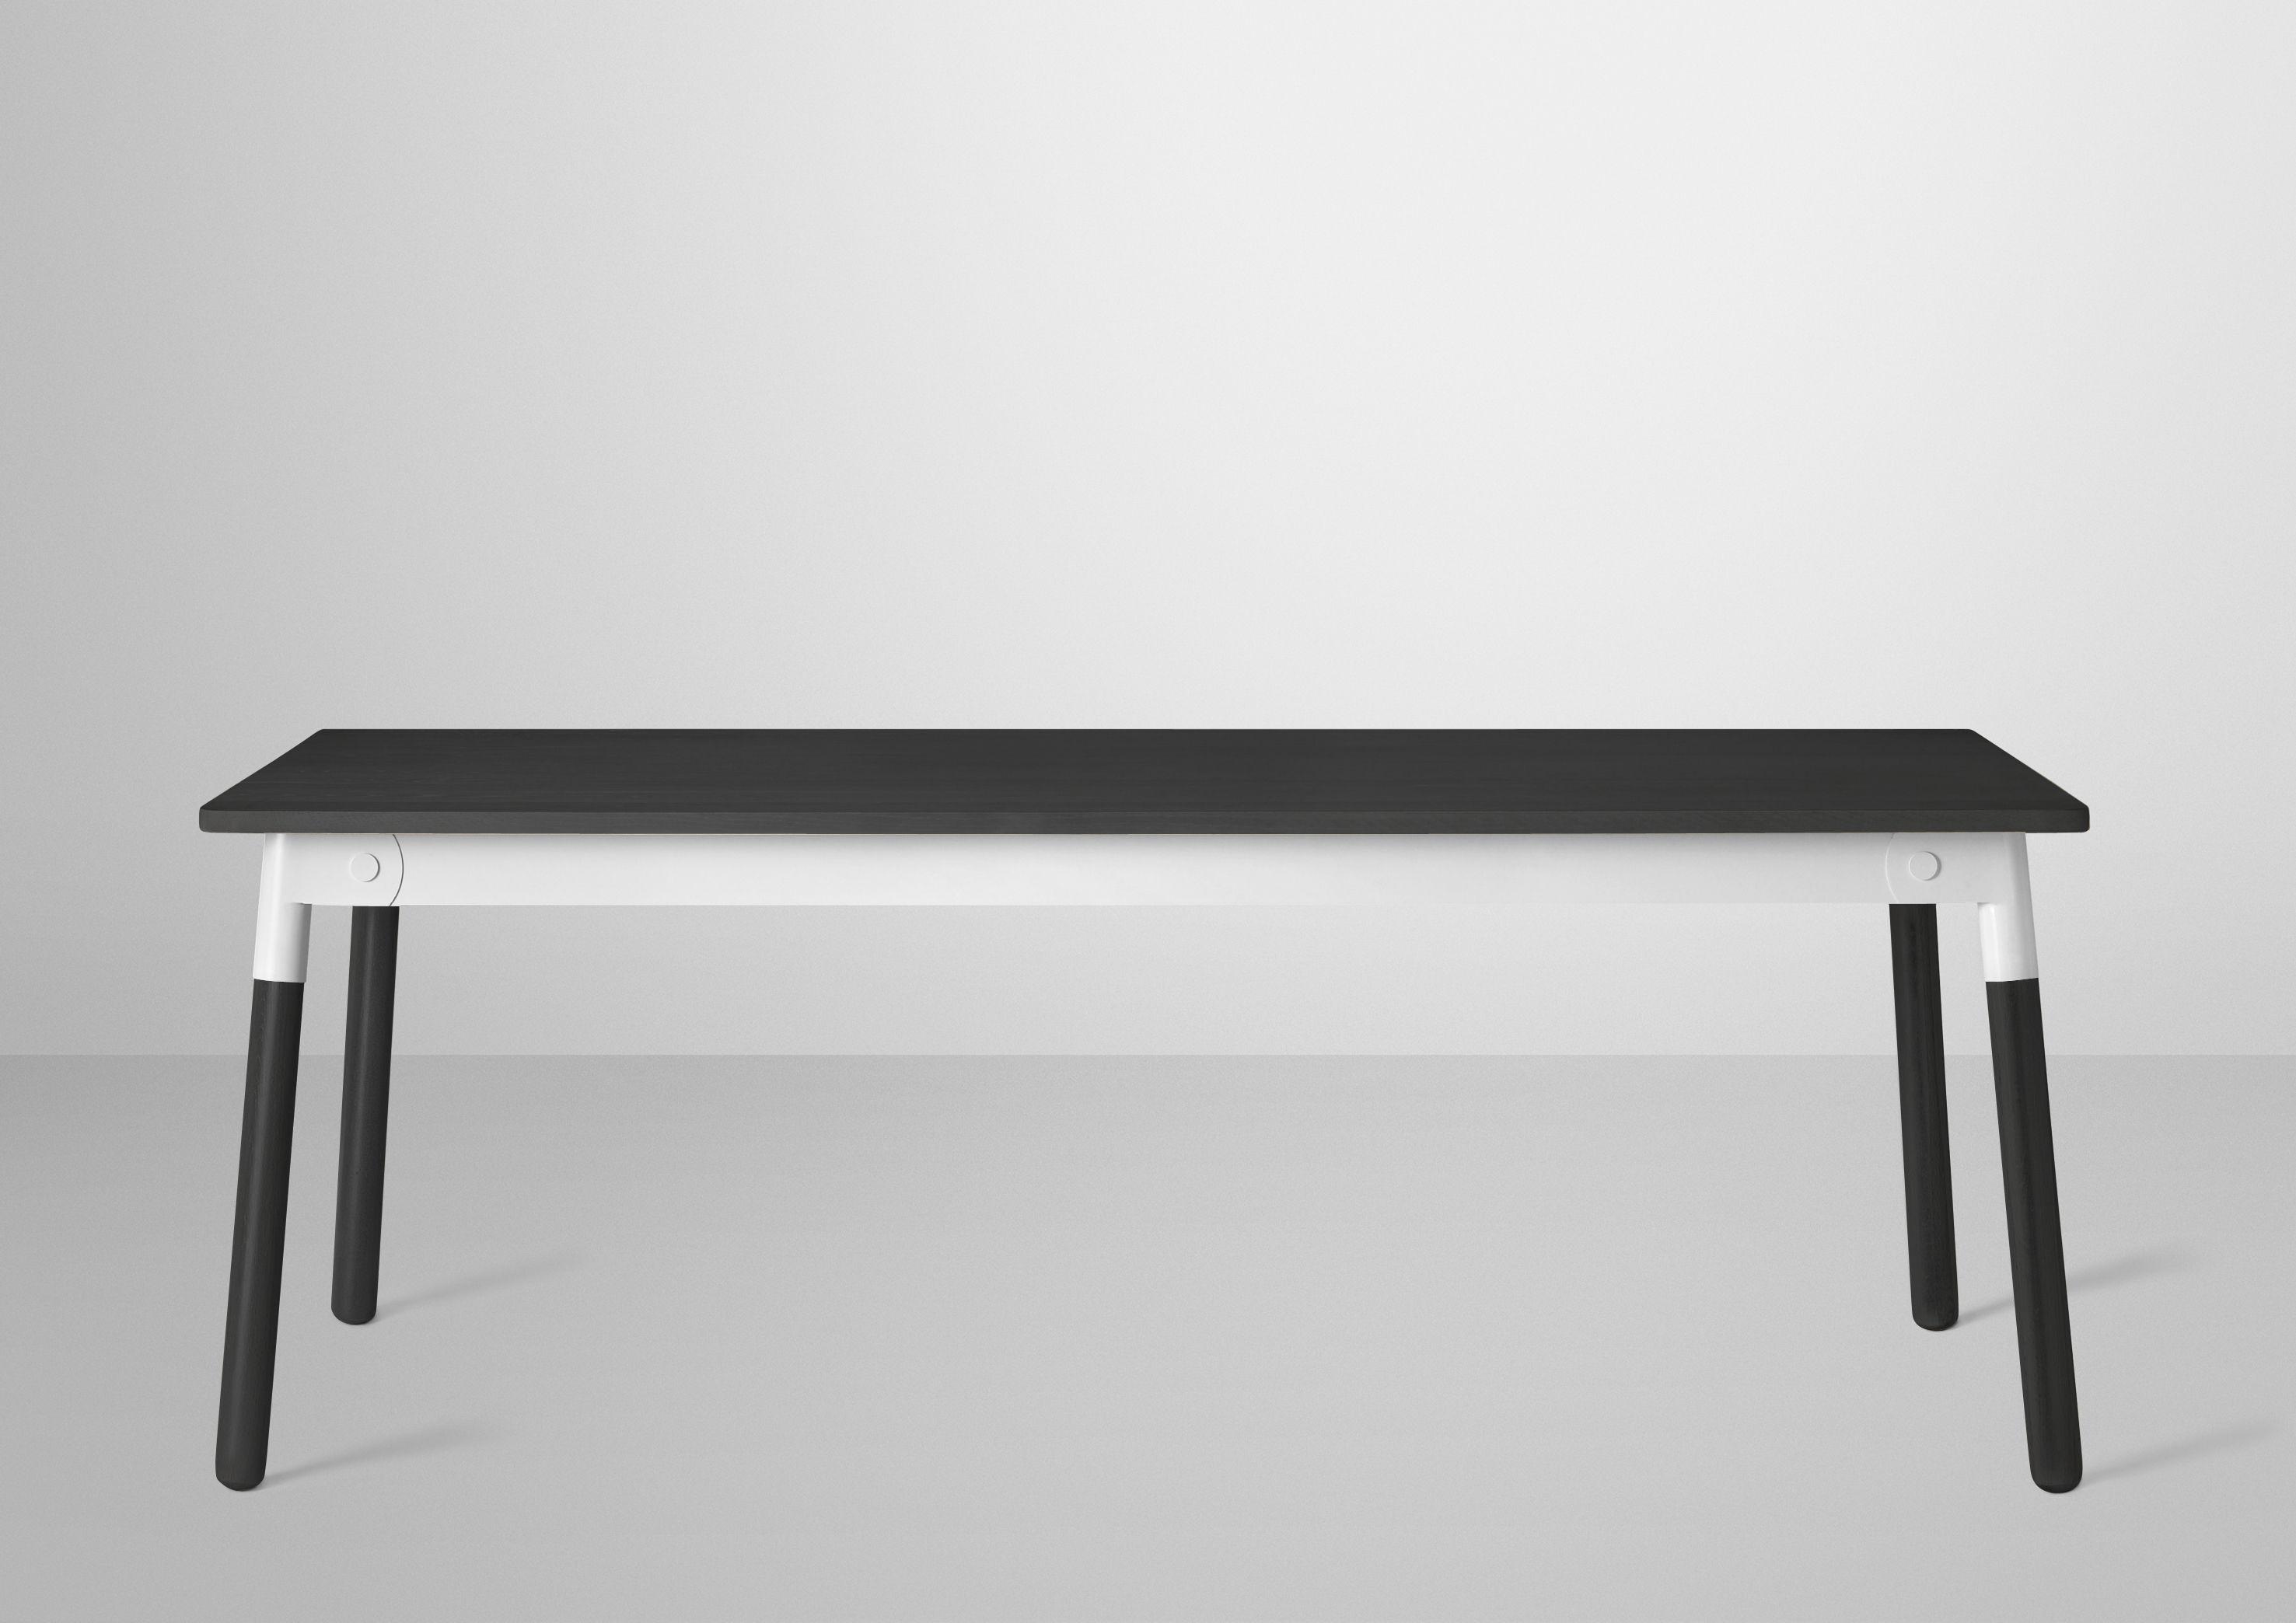 Adaptable Table Black version Black white by Muuto